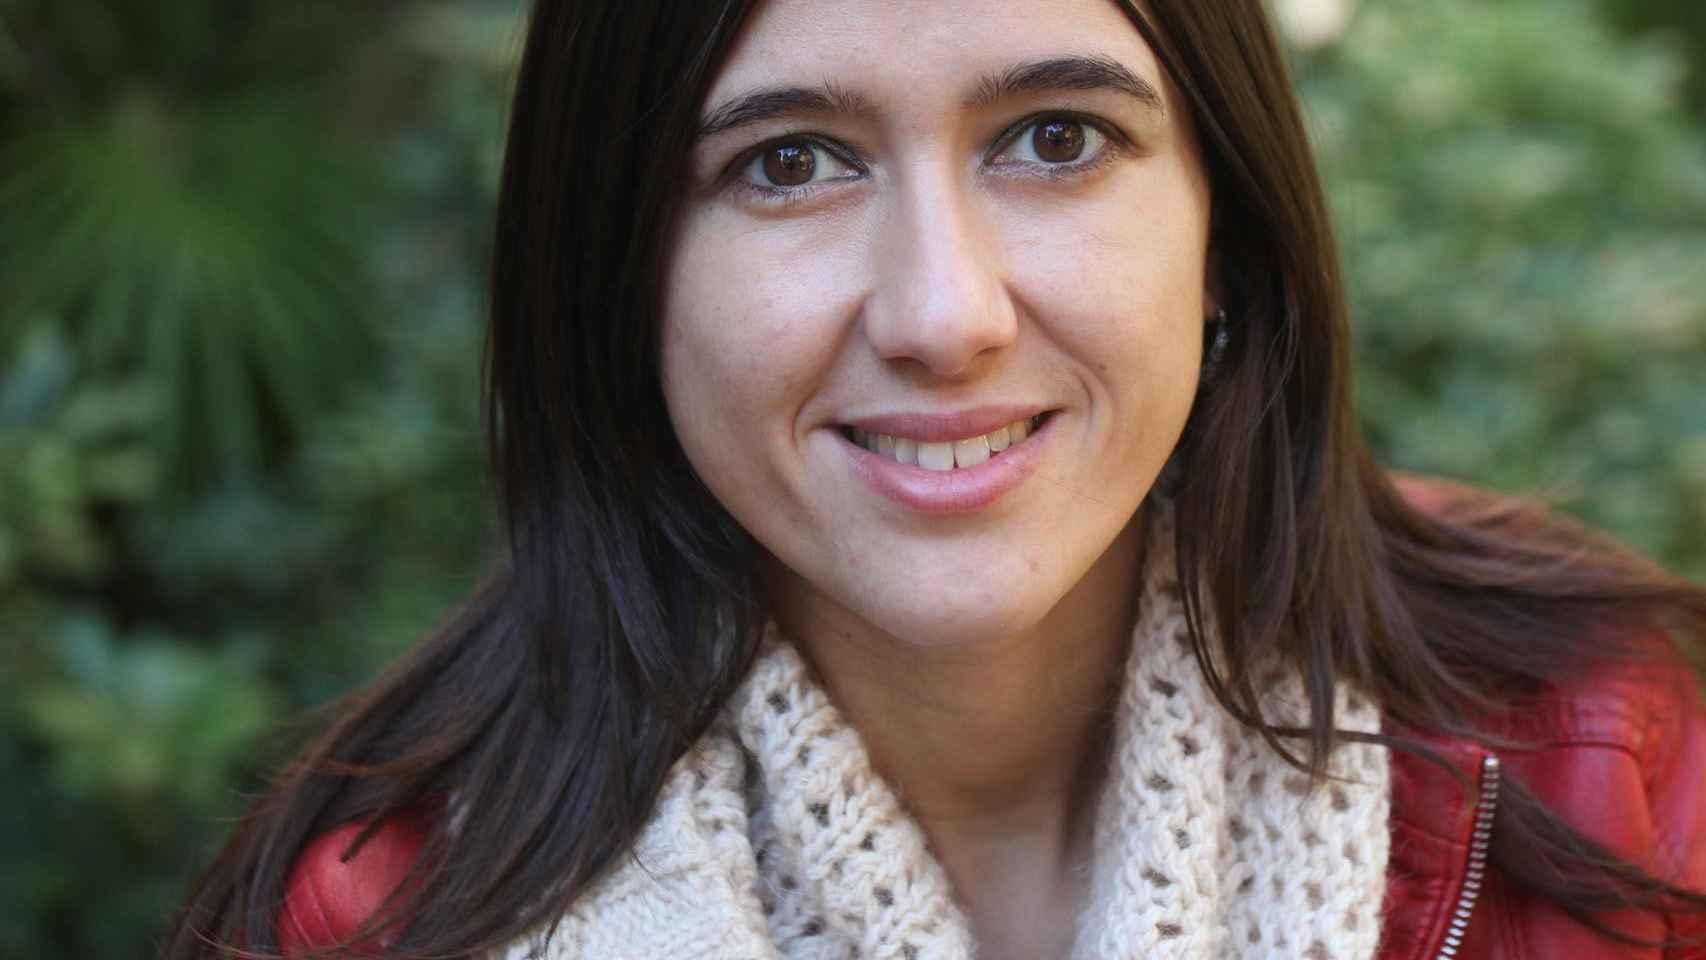 Nuria Parlon